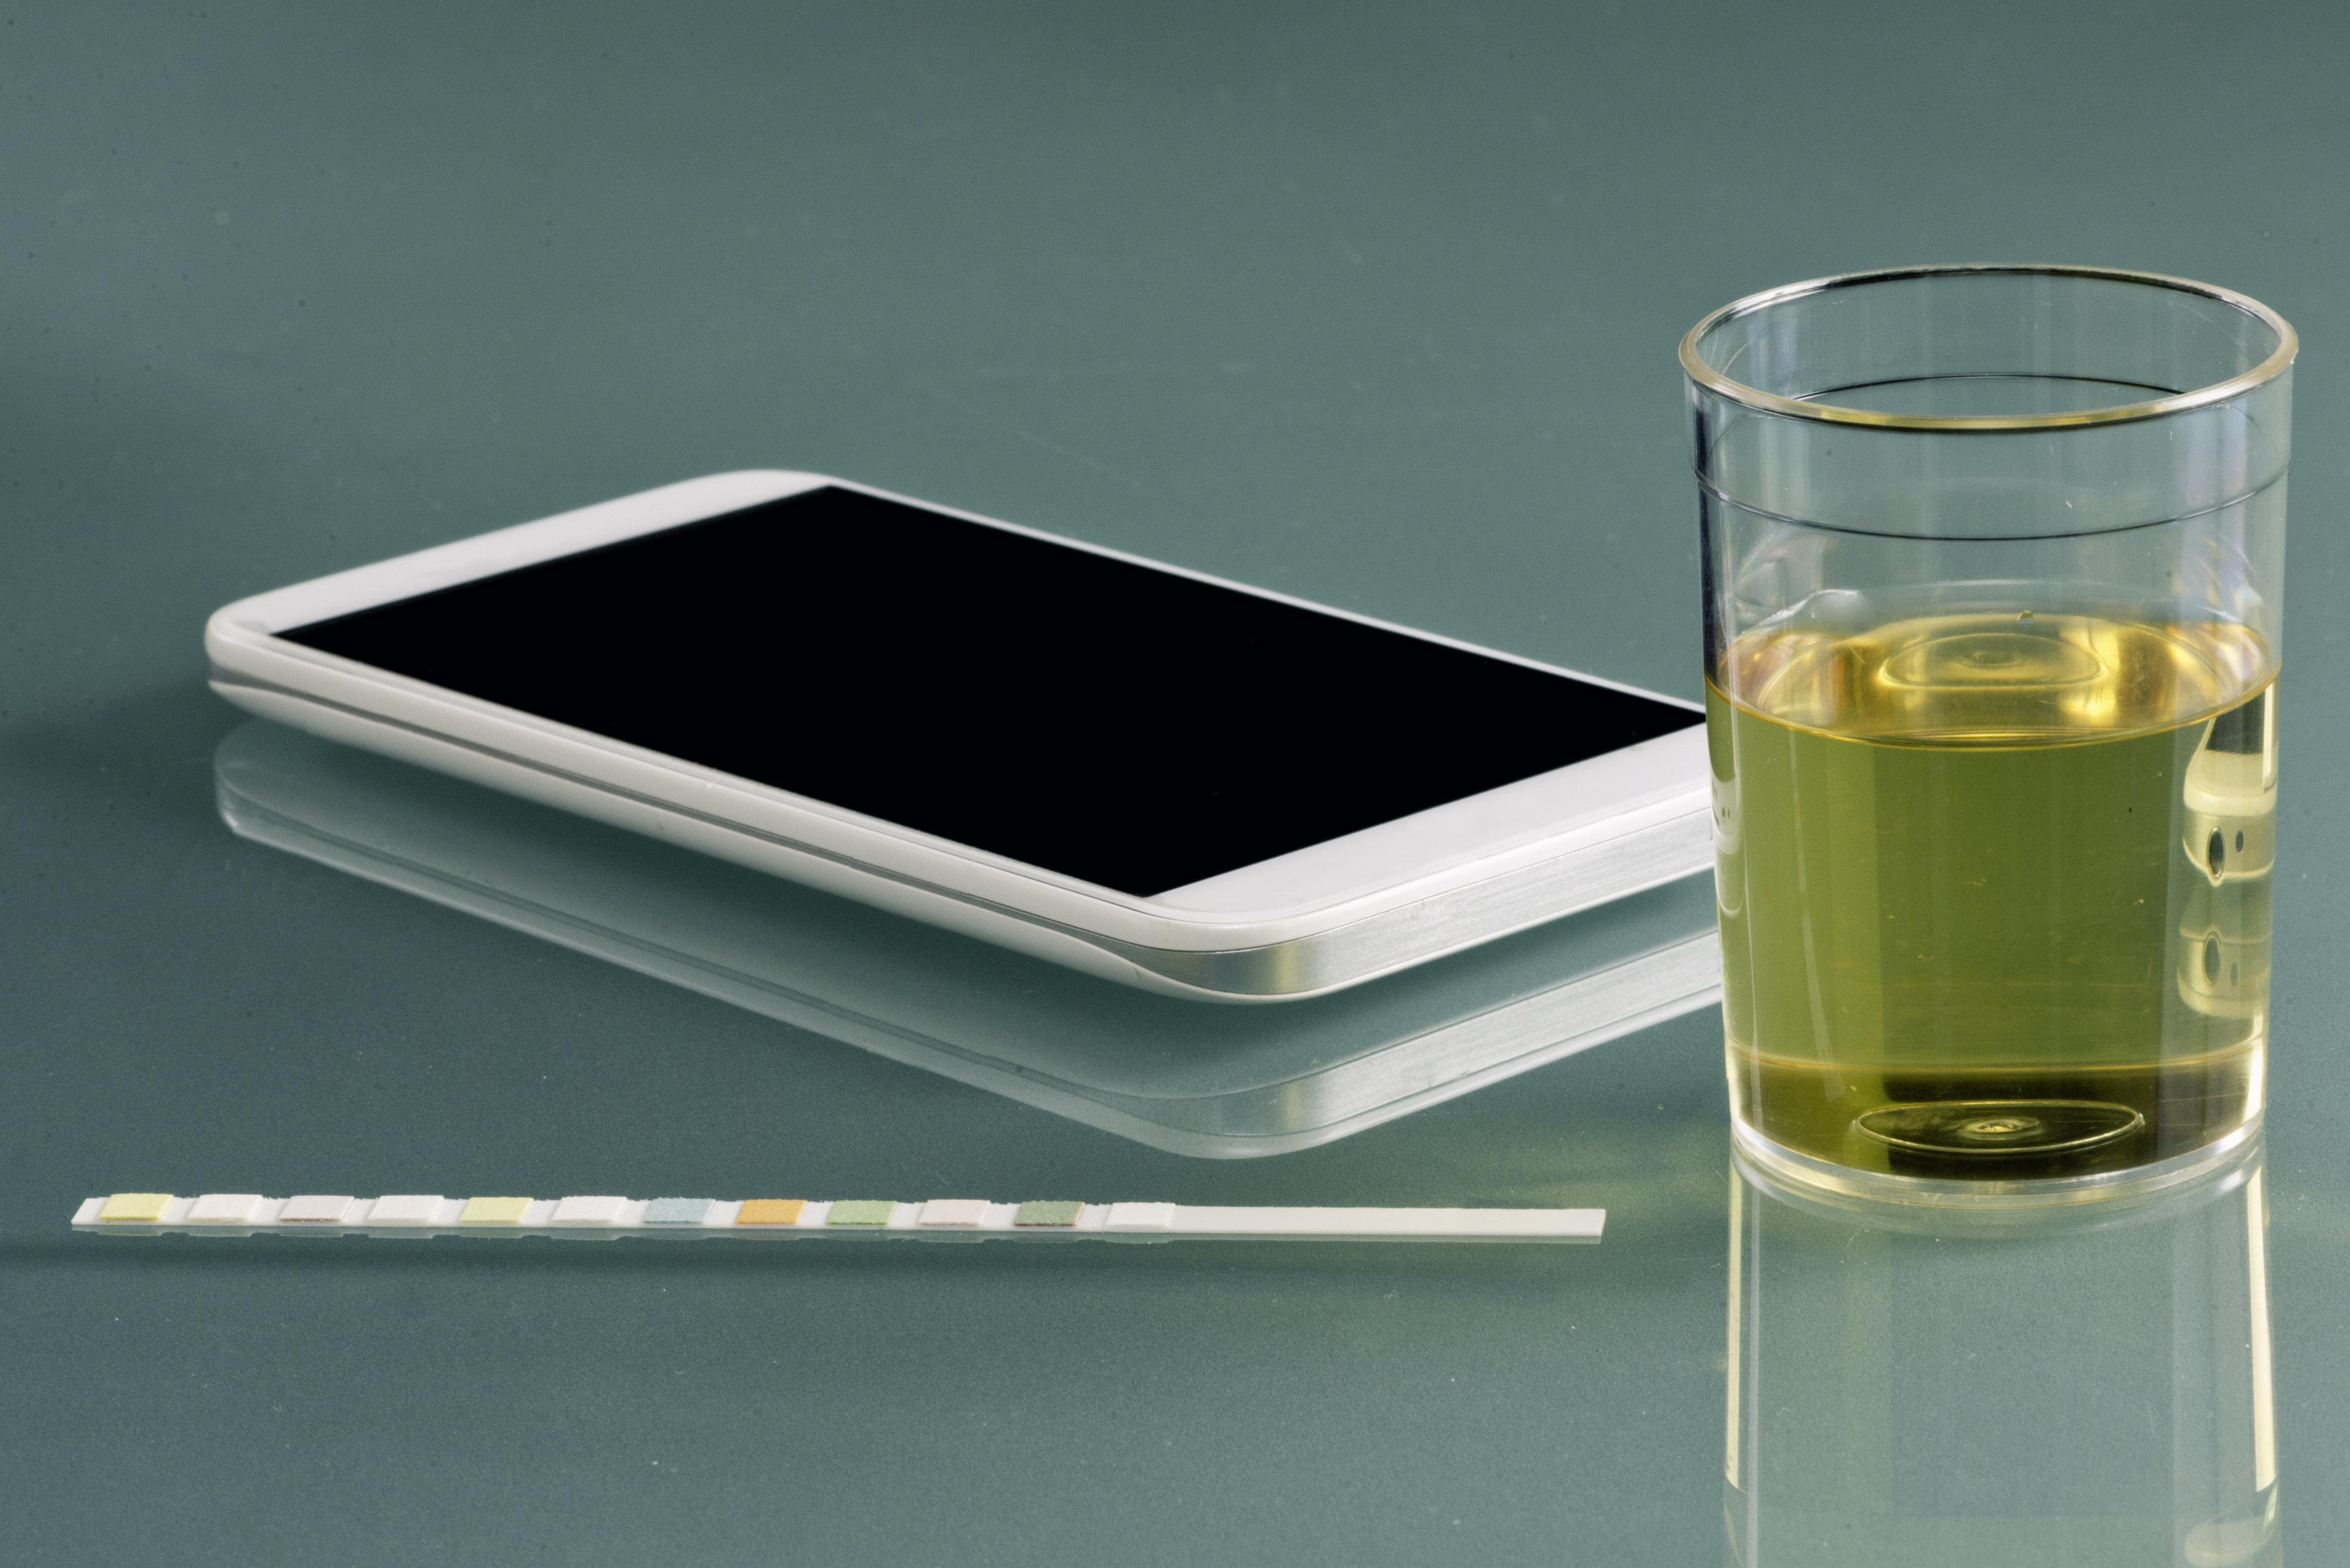 Personal urine testing kit - urine sample, test strip, smart phone with healthcare app